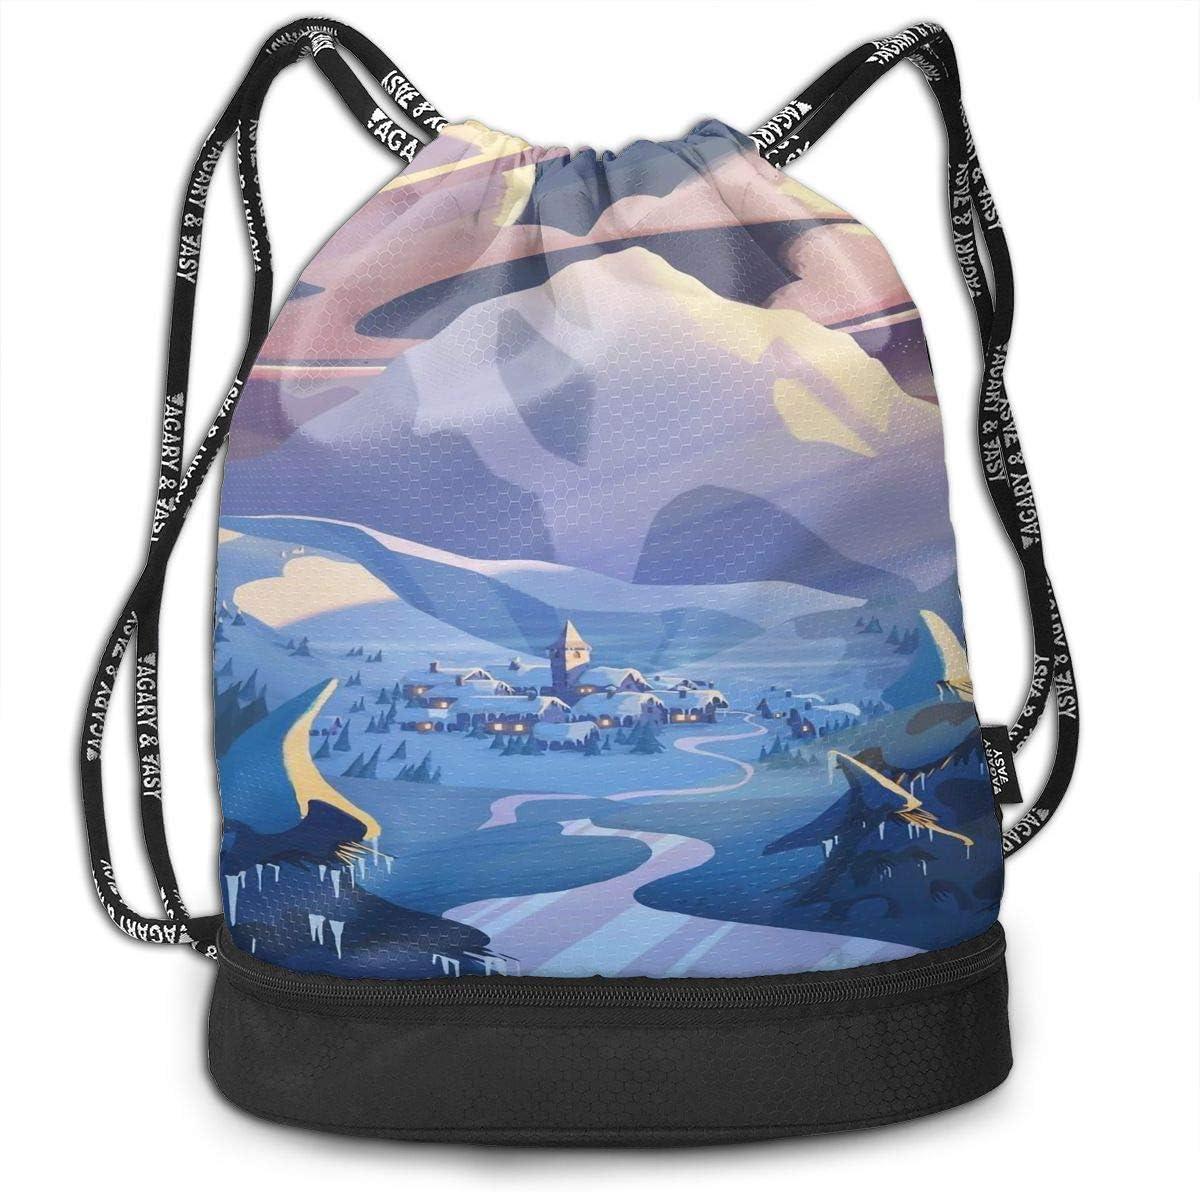 Drawstring Backpack Snow Mountain Mural Gym Bag